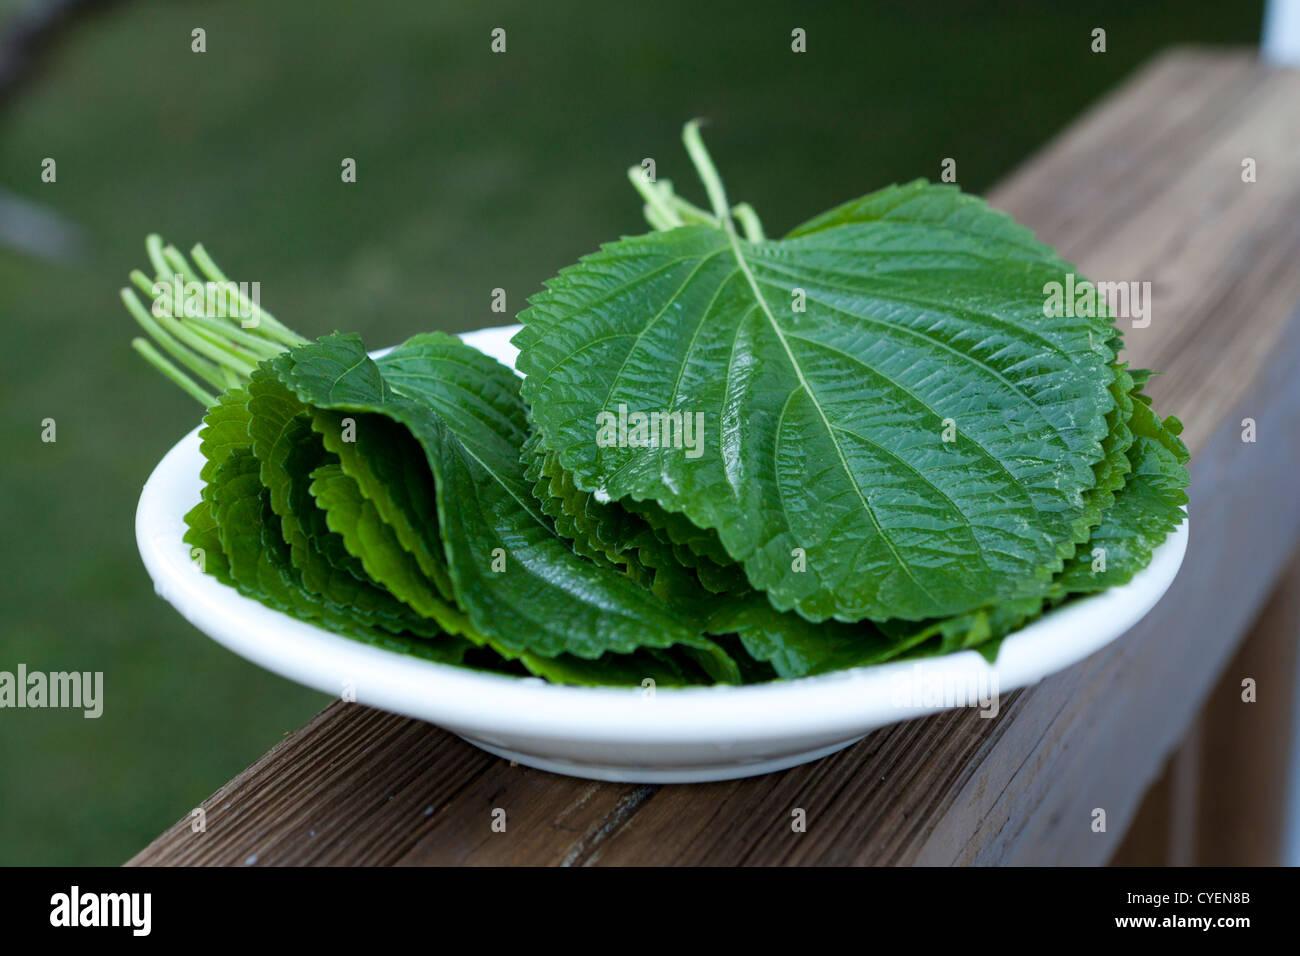 Sesame leaves on plate (Perilla frutescens) - Stock Image